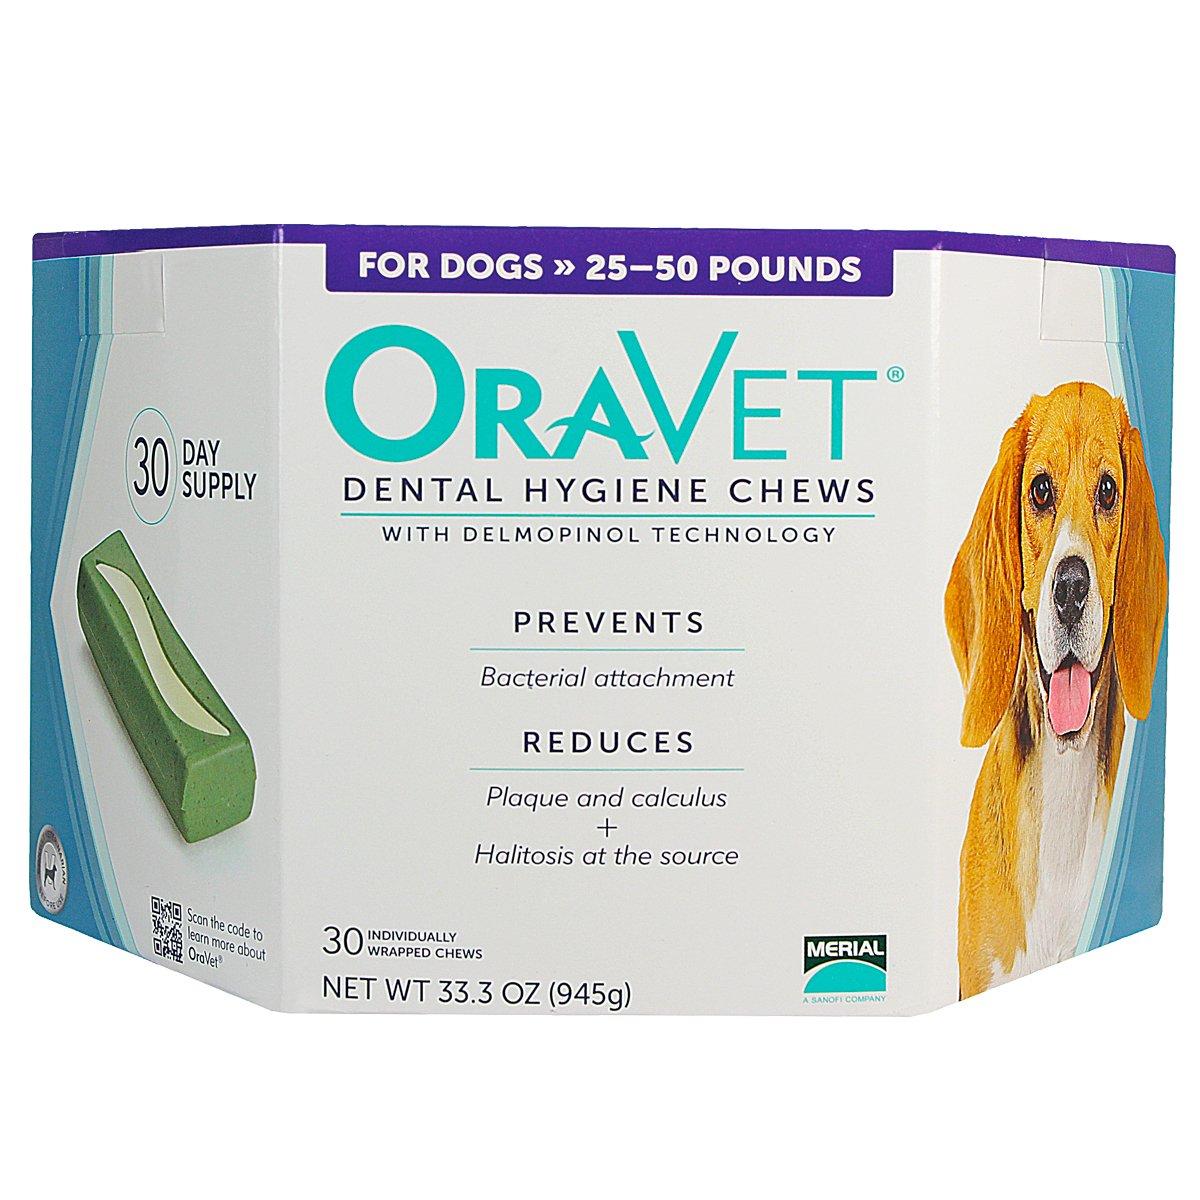 Oravet Dental Hygiene Chews 25-50lbs - 30 chews